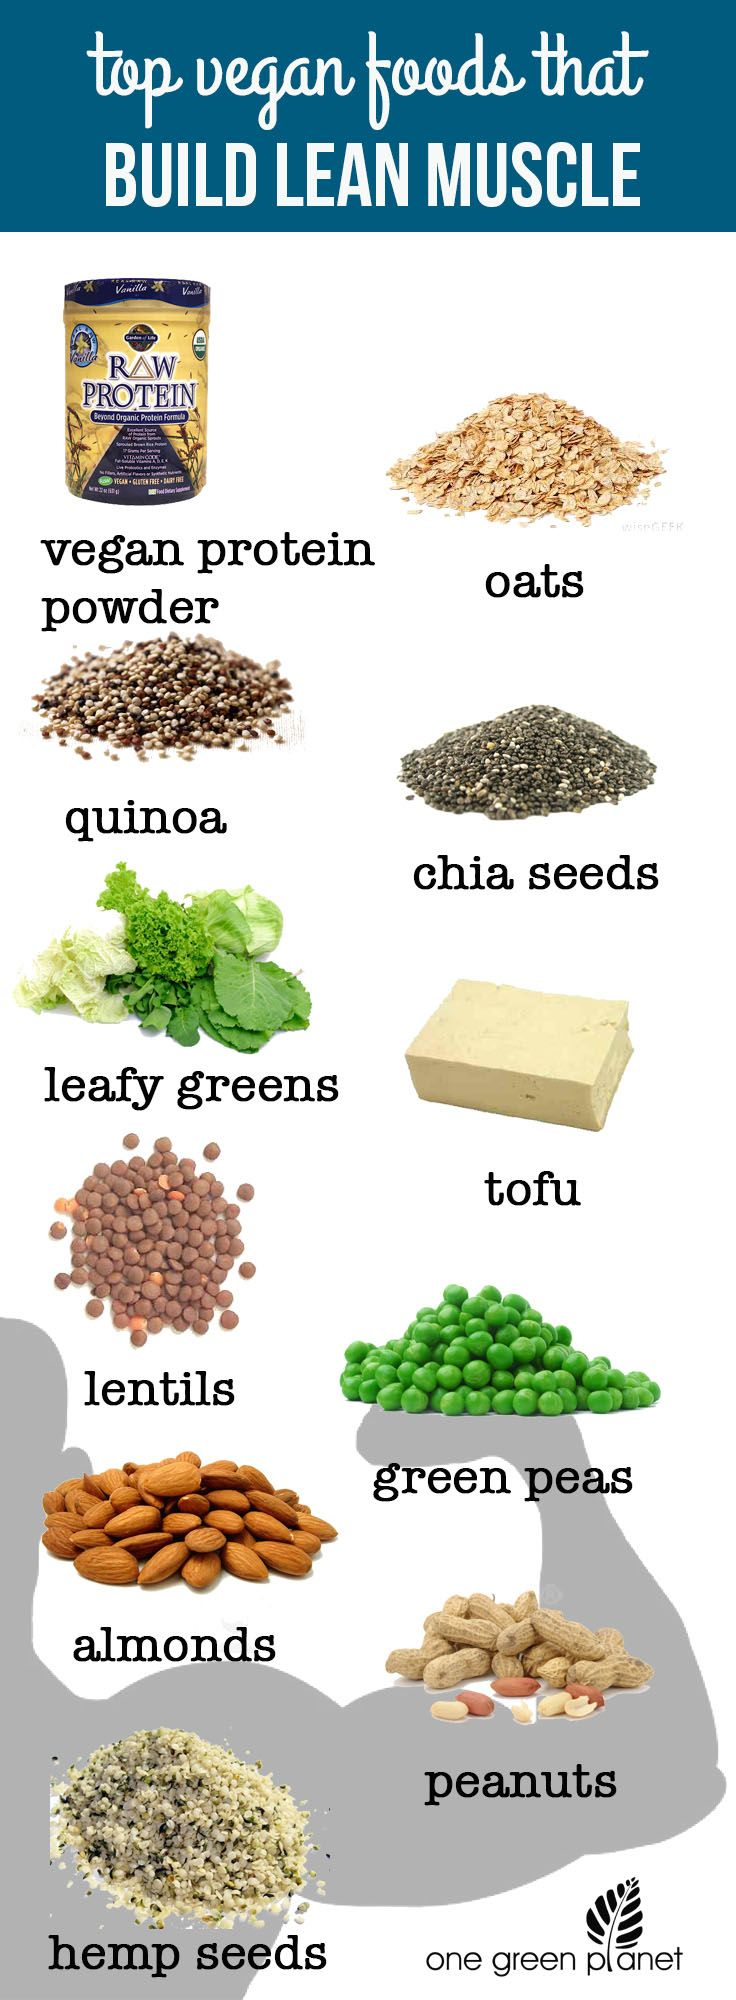 Top Vegan Foods That Build Lean Muscle Vegan nutrition